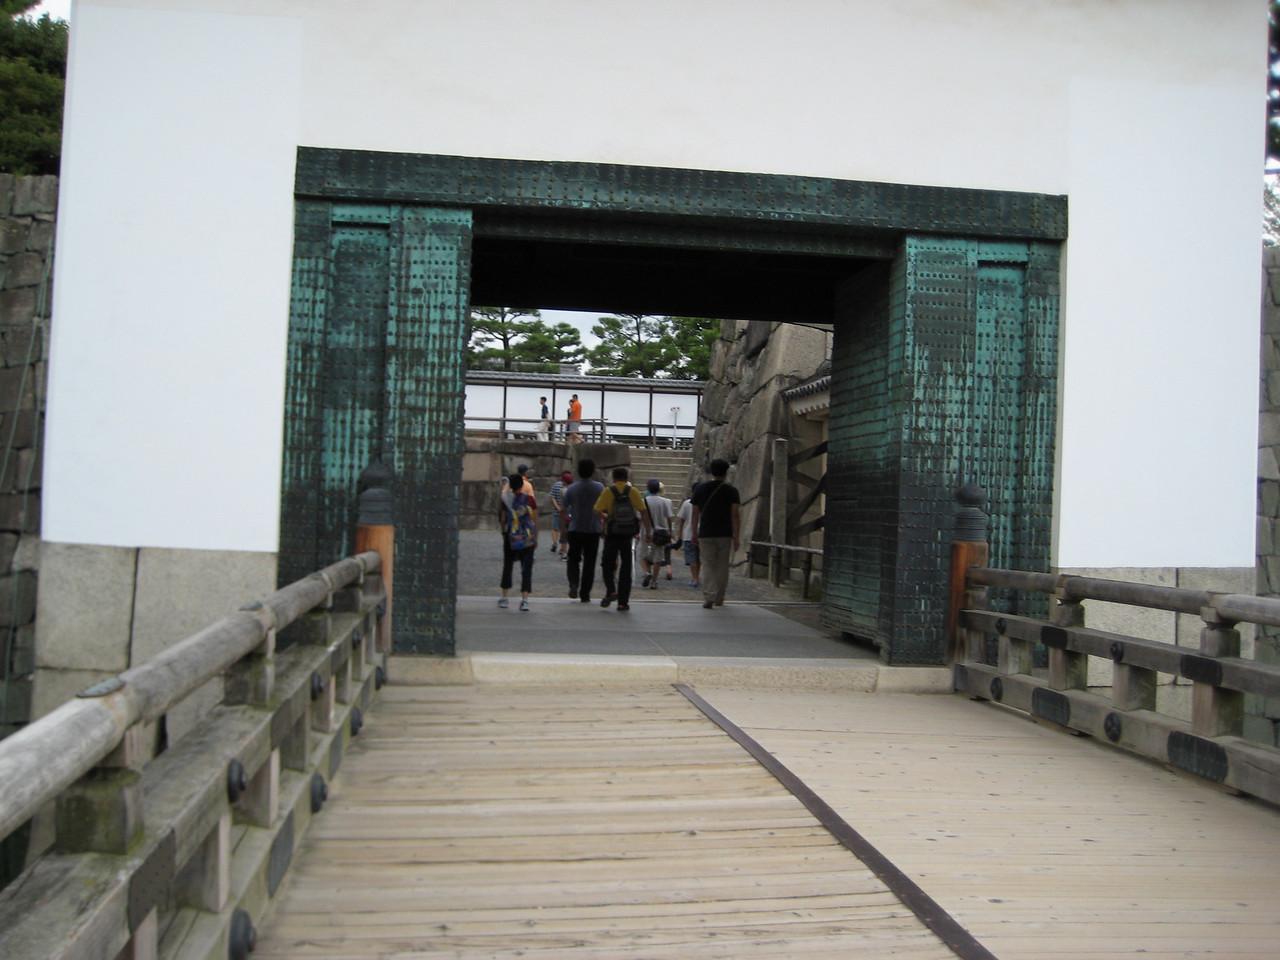 The Honmaru Turret Gate leading into the Honmaru Palace complex